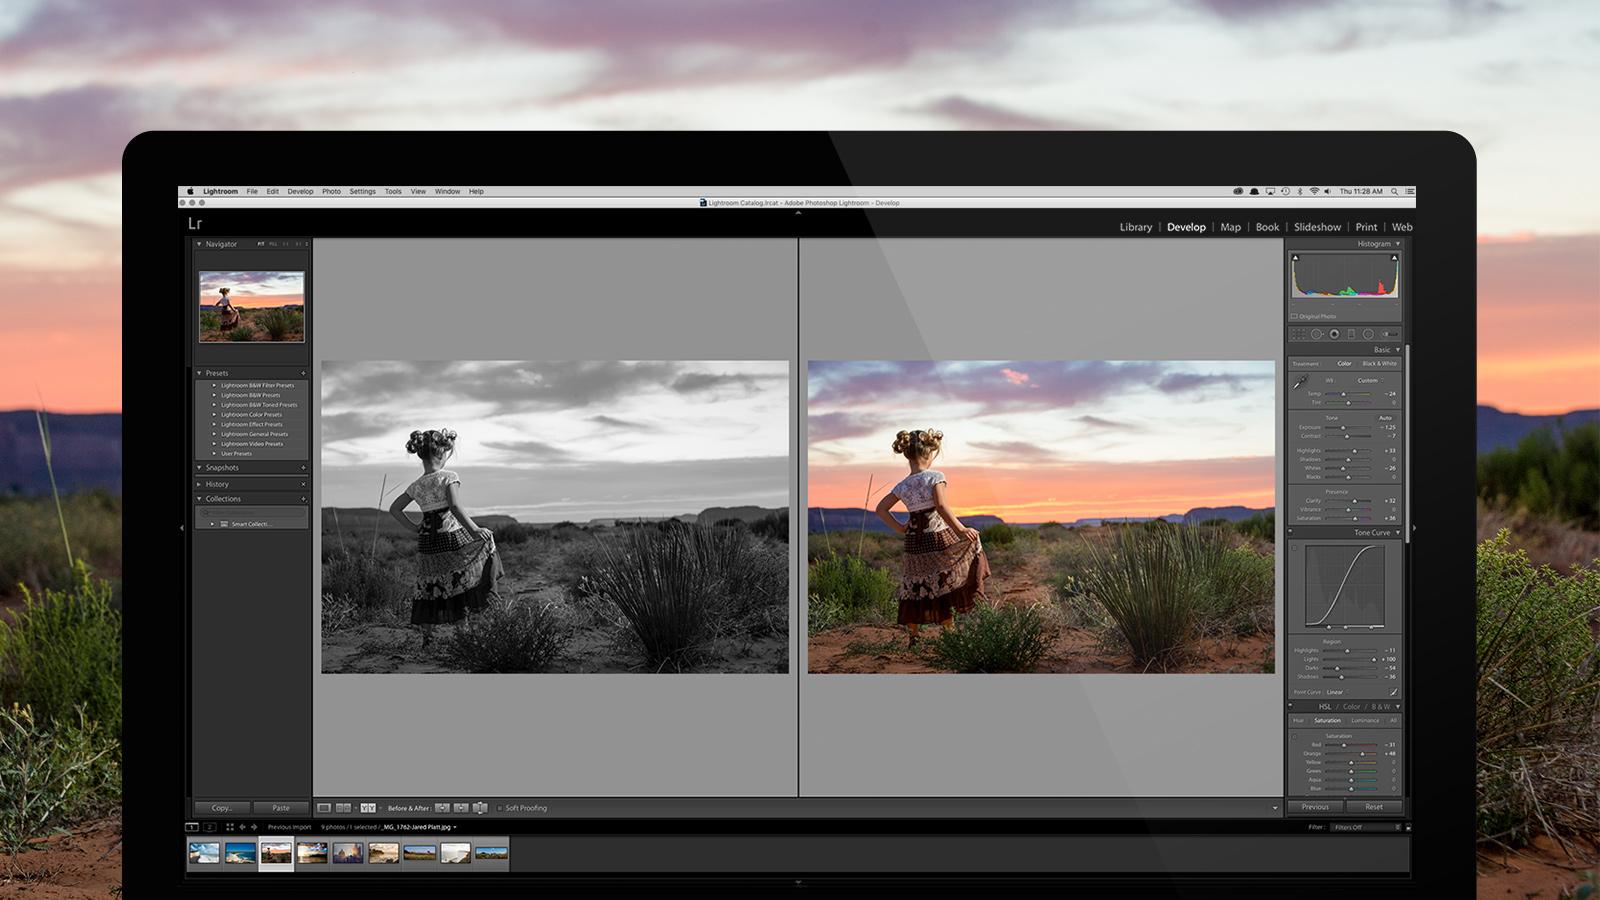 Adobe Photoshop Lightroom Classic CC 2019 v8.2.1.10 (Pre